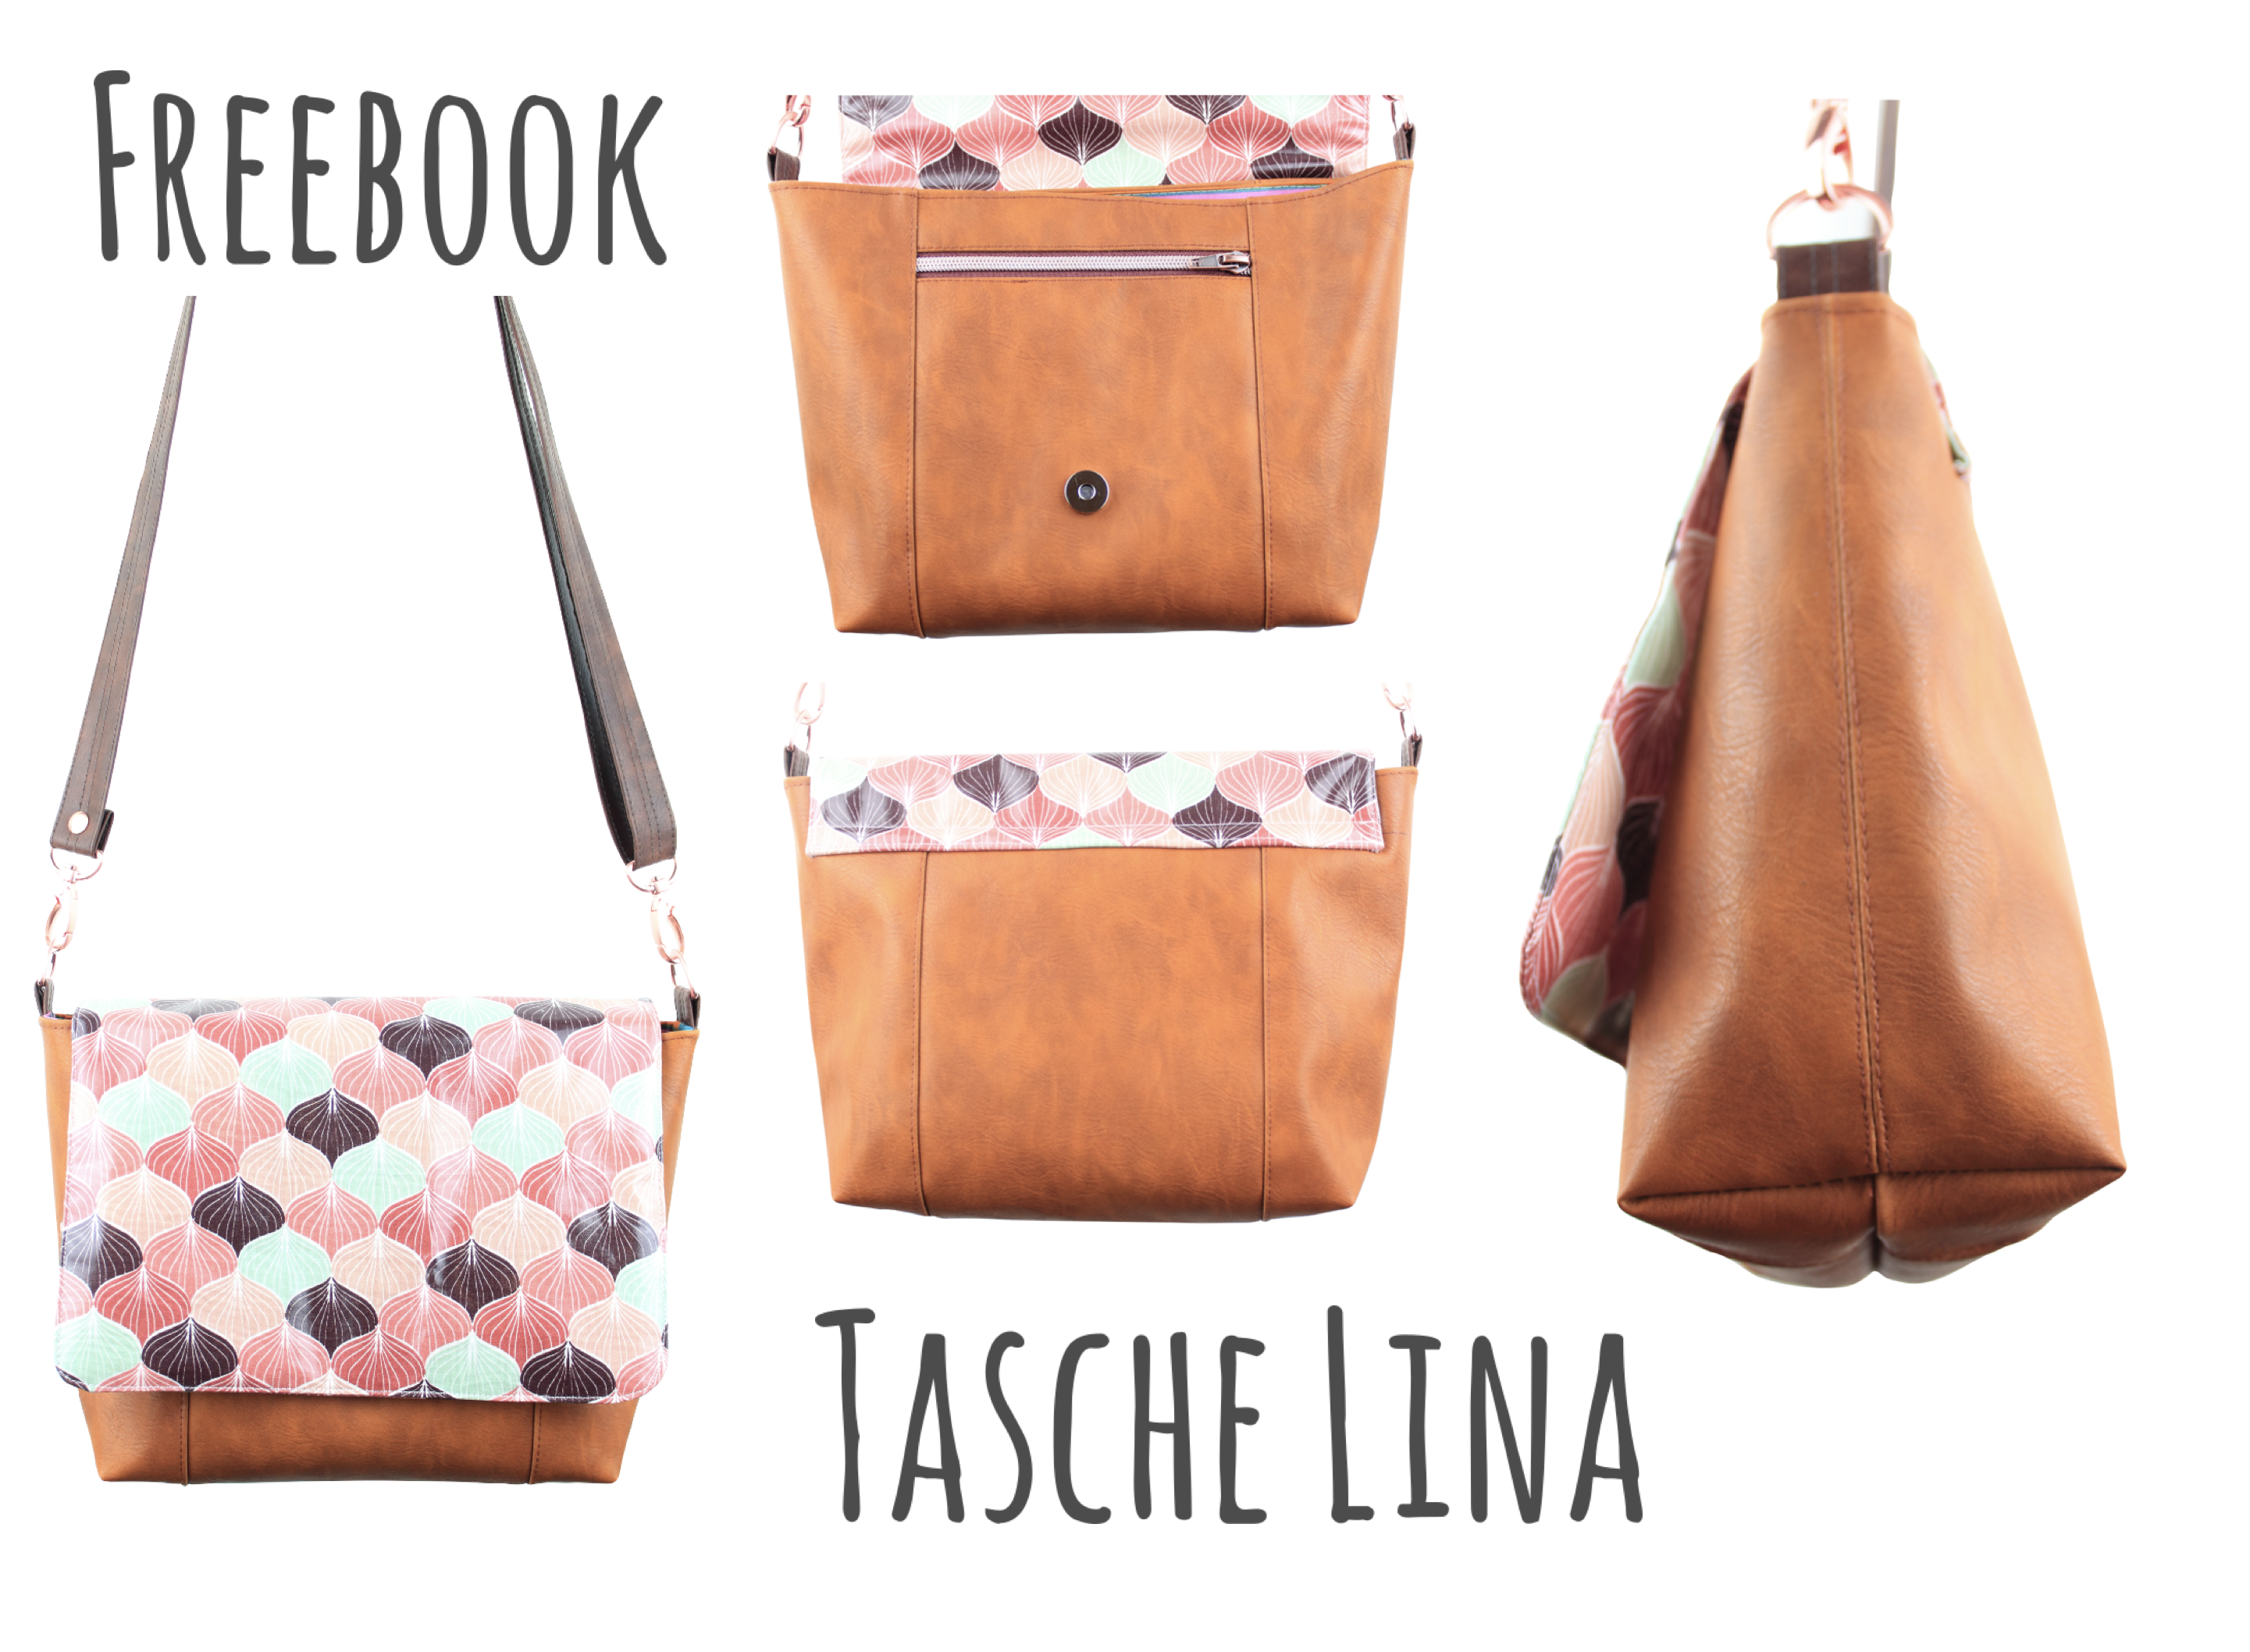 Freebook Tasche Lina ist da! – Bolsa de moda